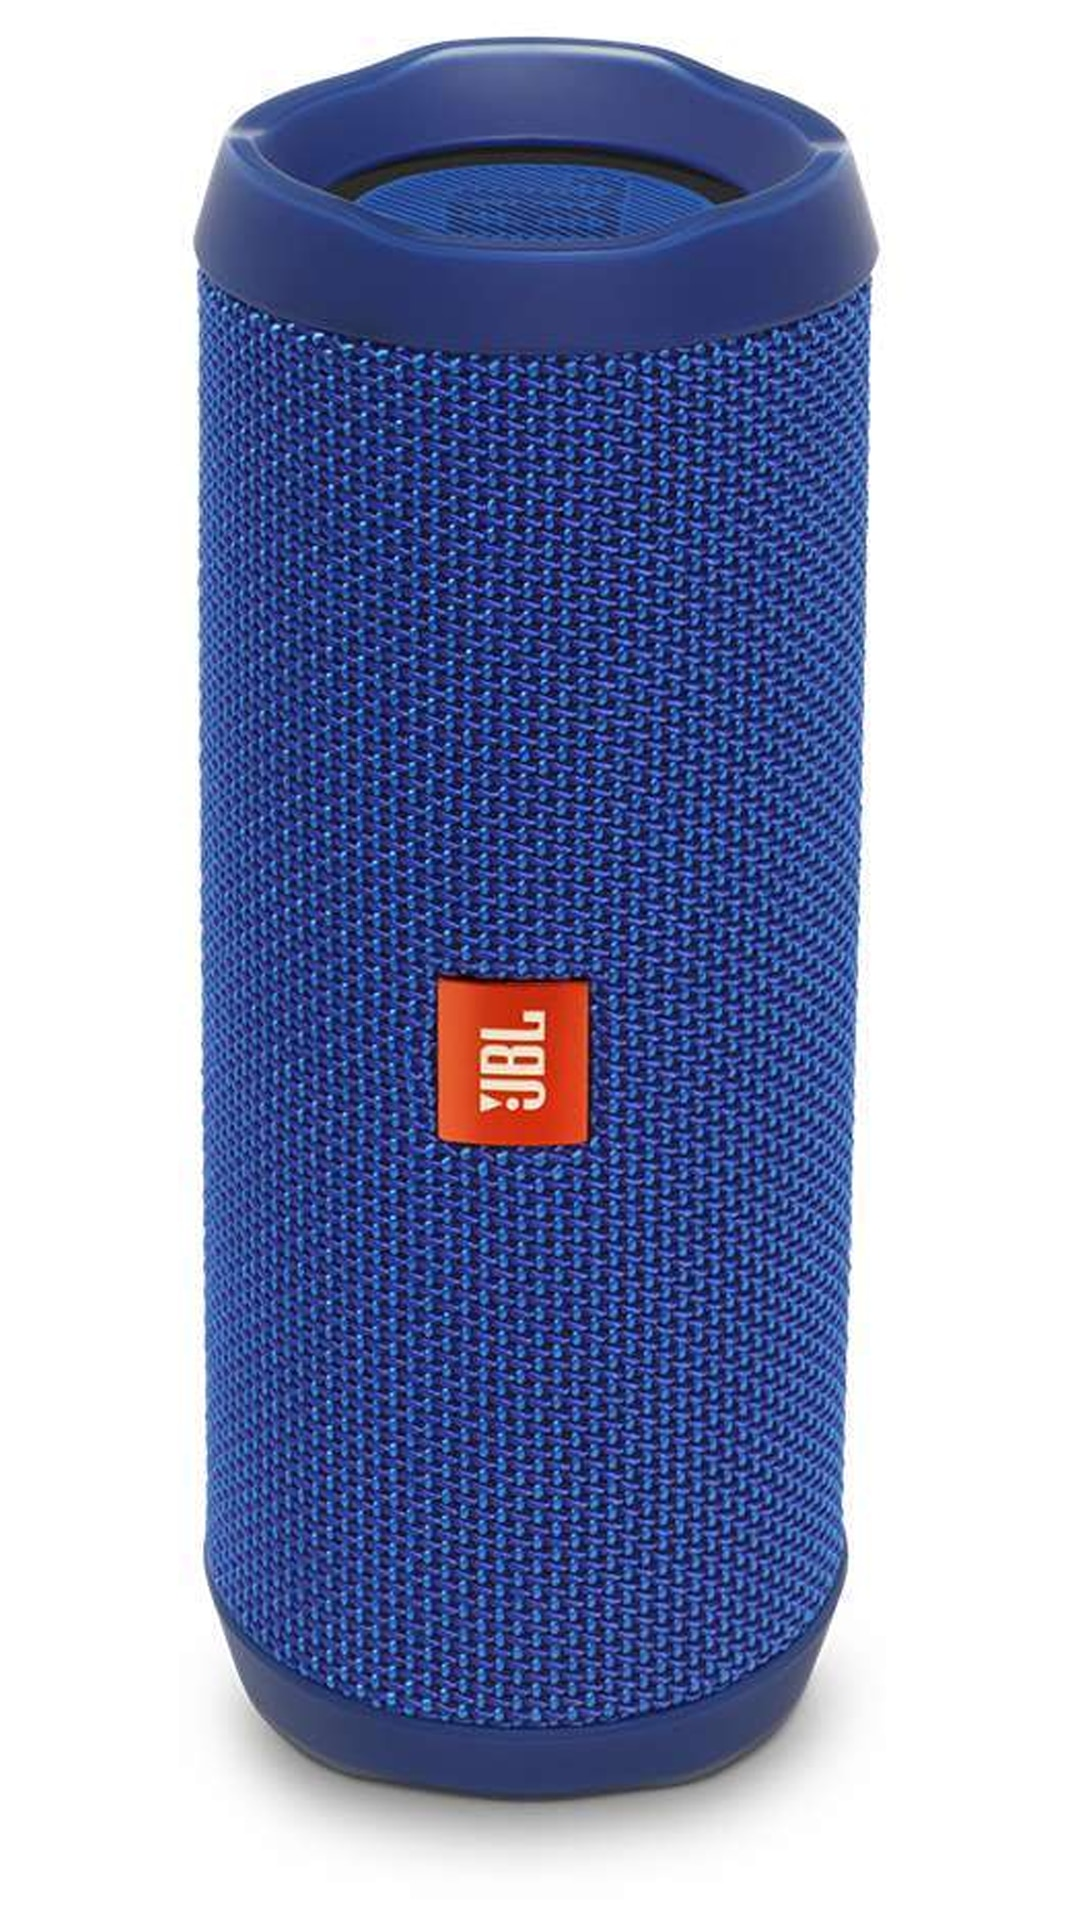 JBL Flip 4 Bluetooth Speaker (Blue)